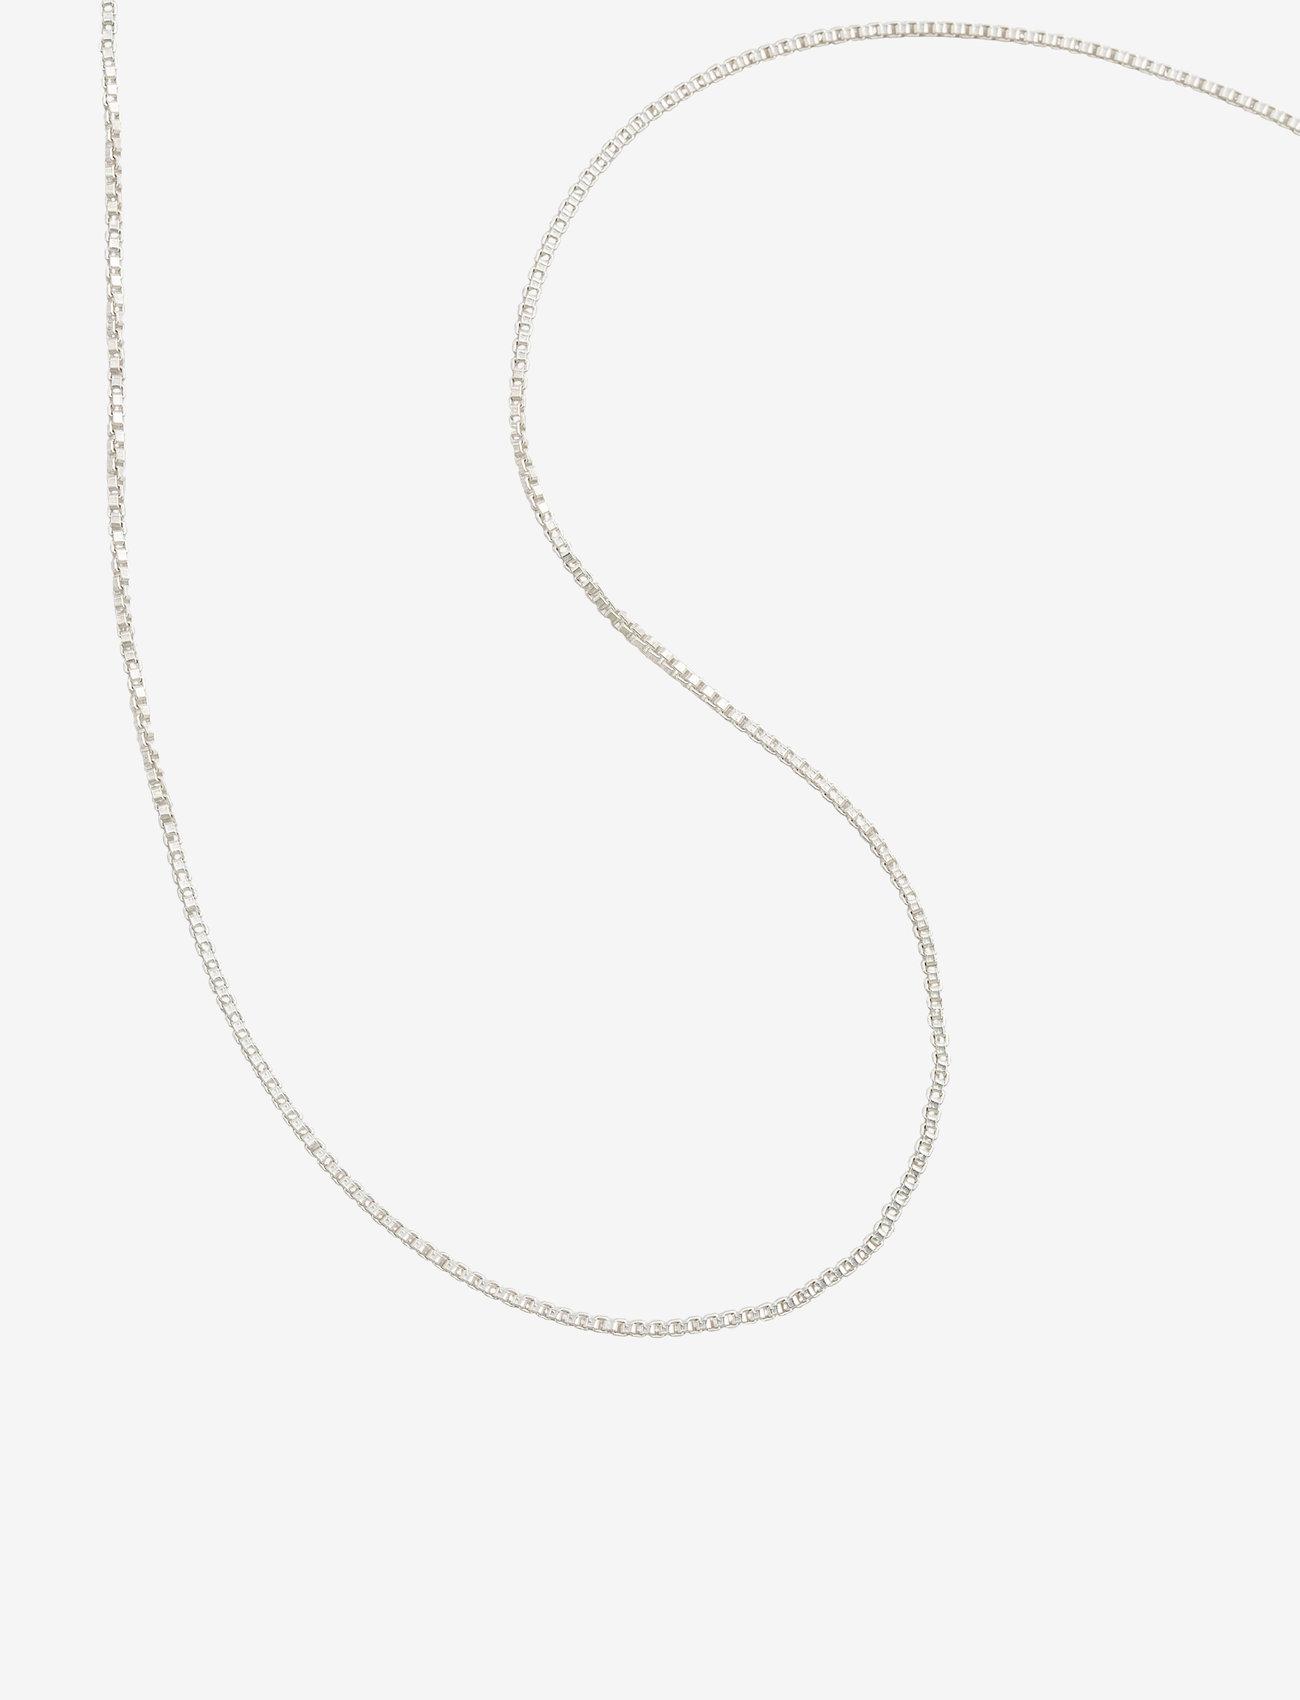 Syster P Beloved Short Box Chain Silver - Biżuteria SILVER - Akcesoria